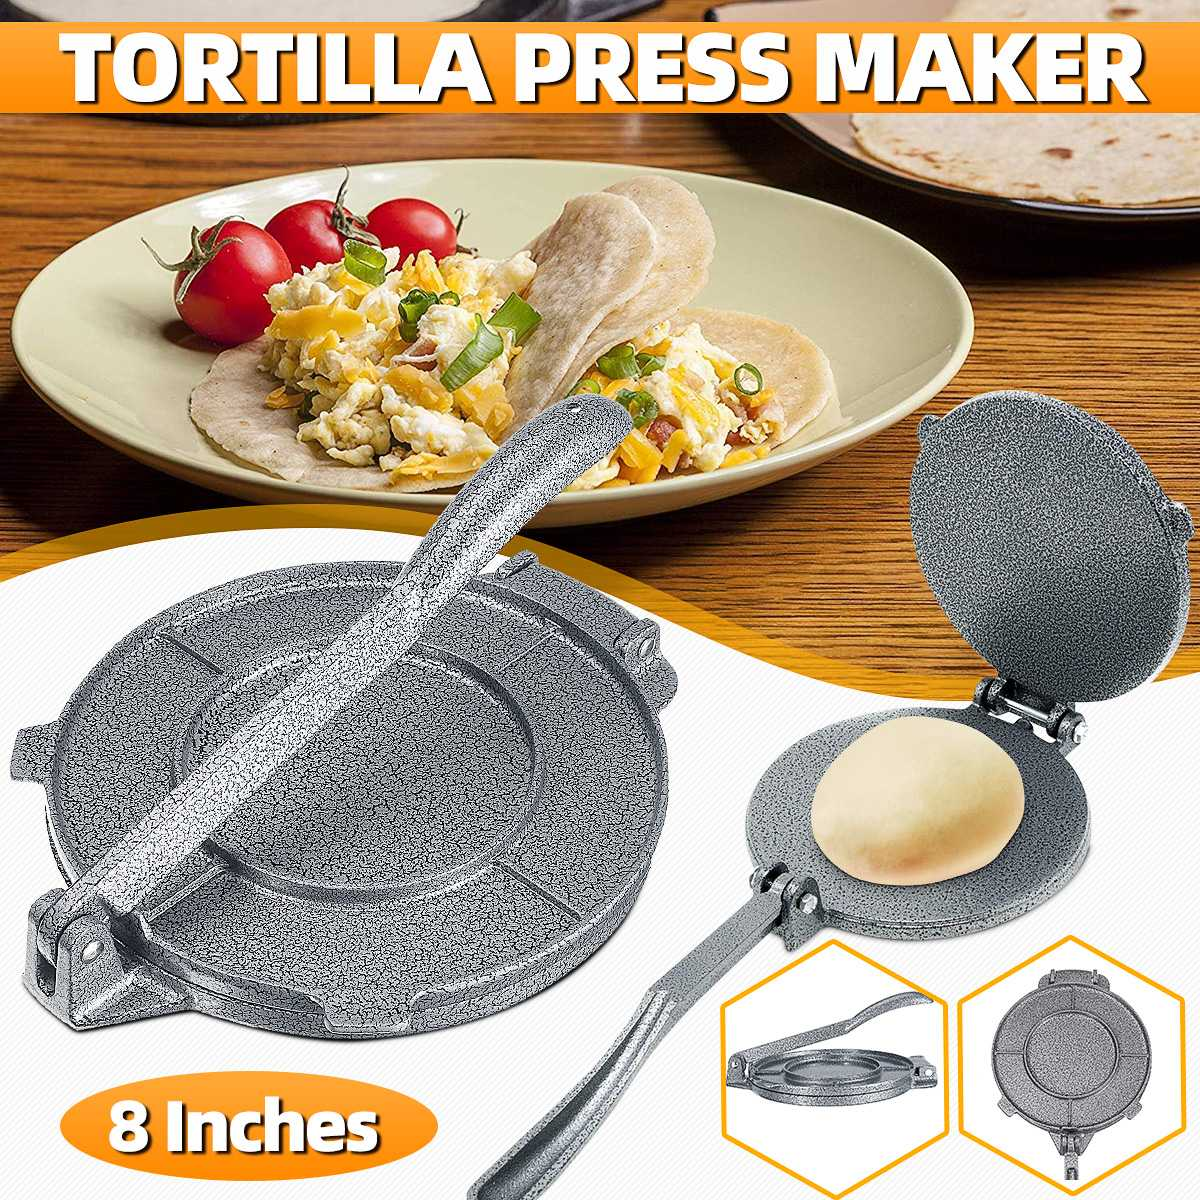 Máquina de prensado de tortillas, aluminio plegable para hornear utensilio de harina...